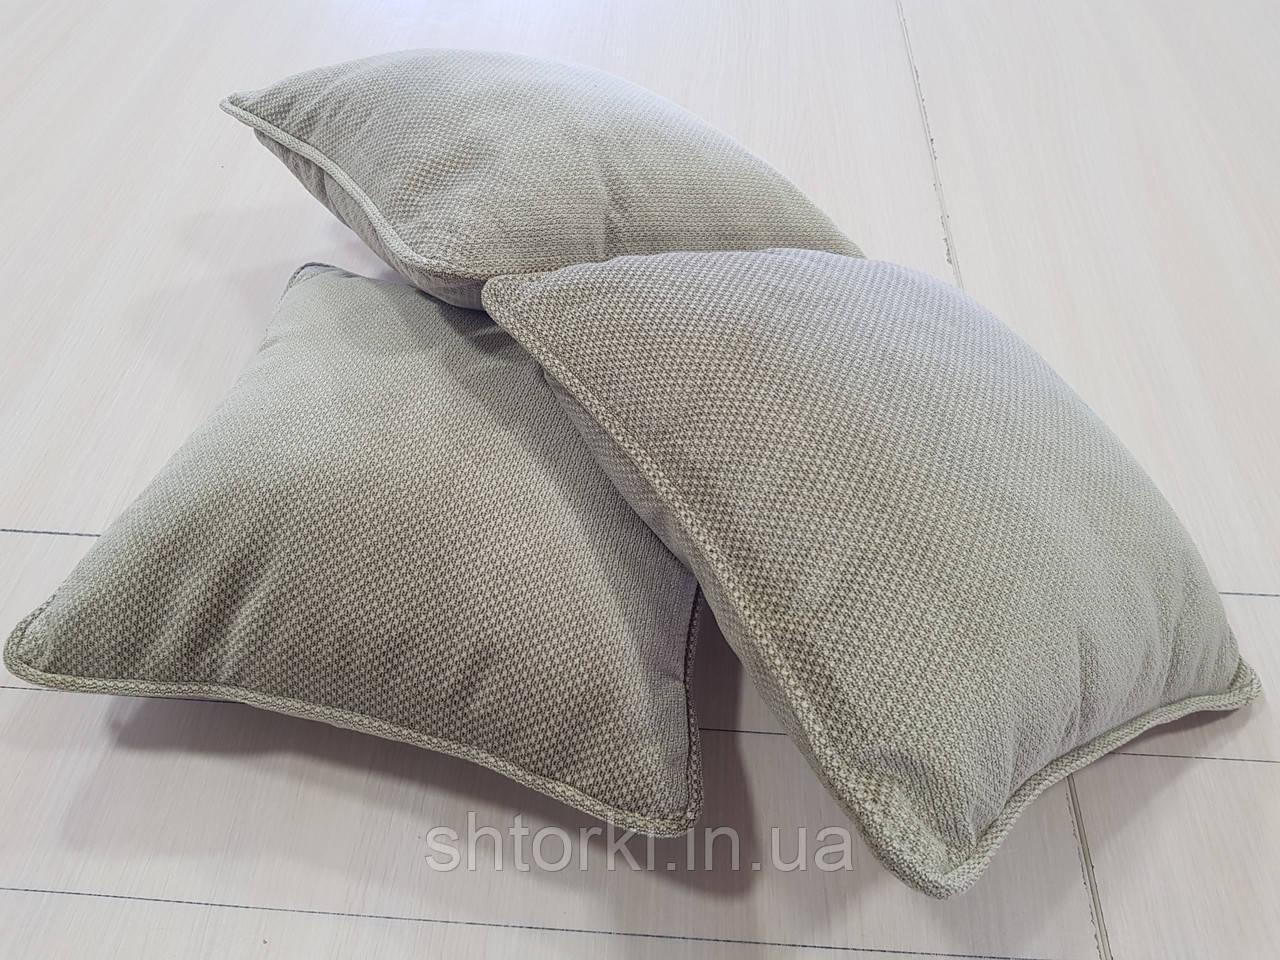 Комплект подушек беж с рубчиком 3шт